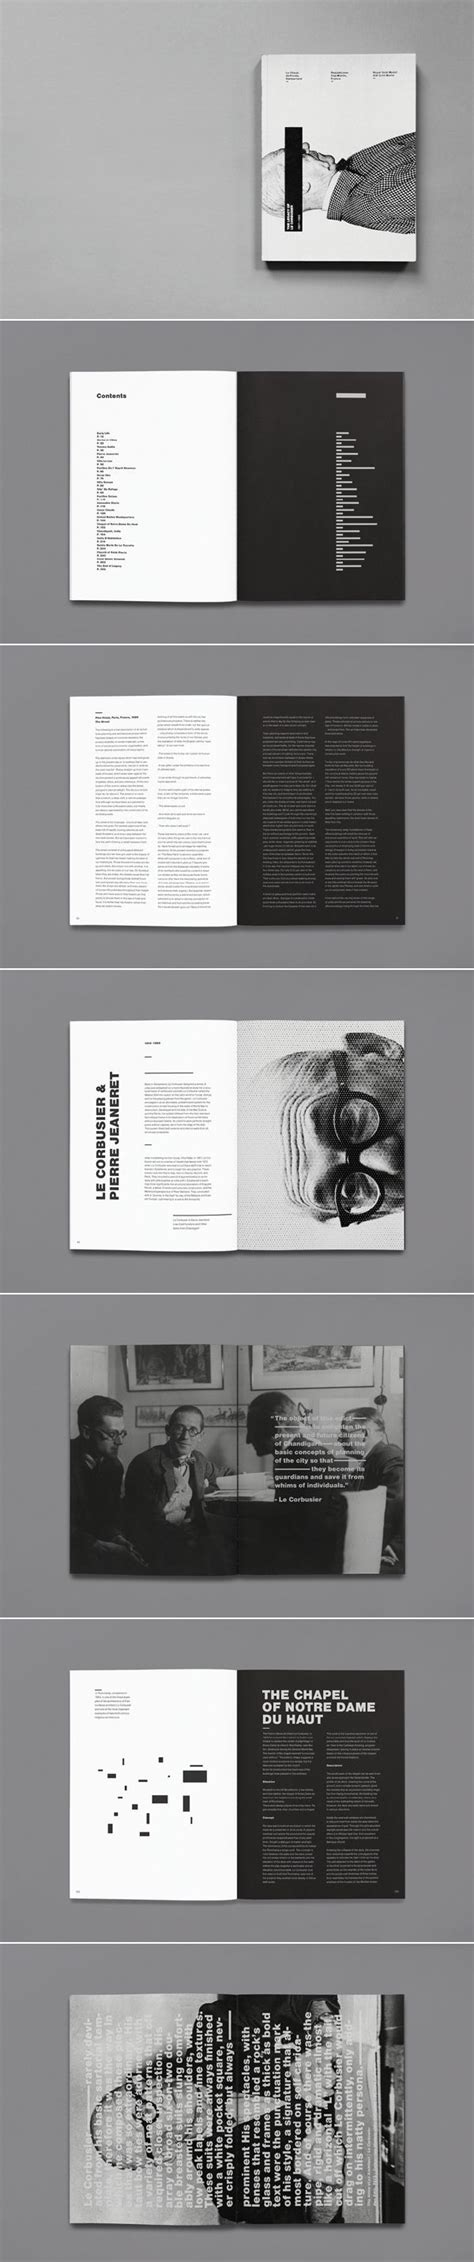 text layout design inspiration 3519 best design inspiration images on pinterest graph